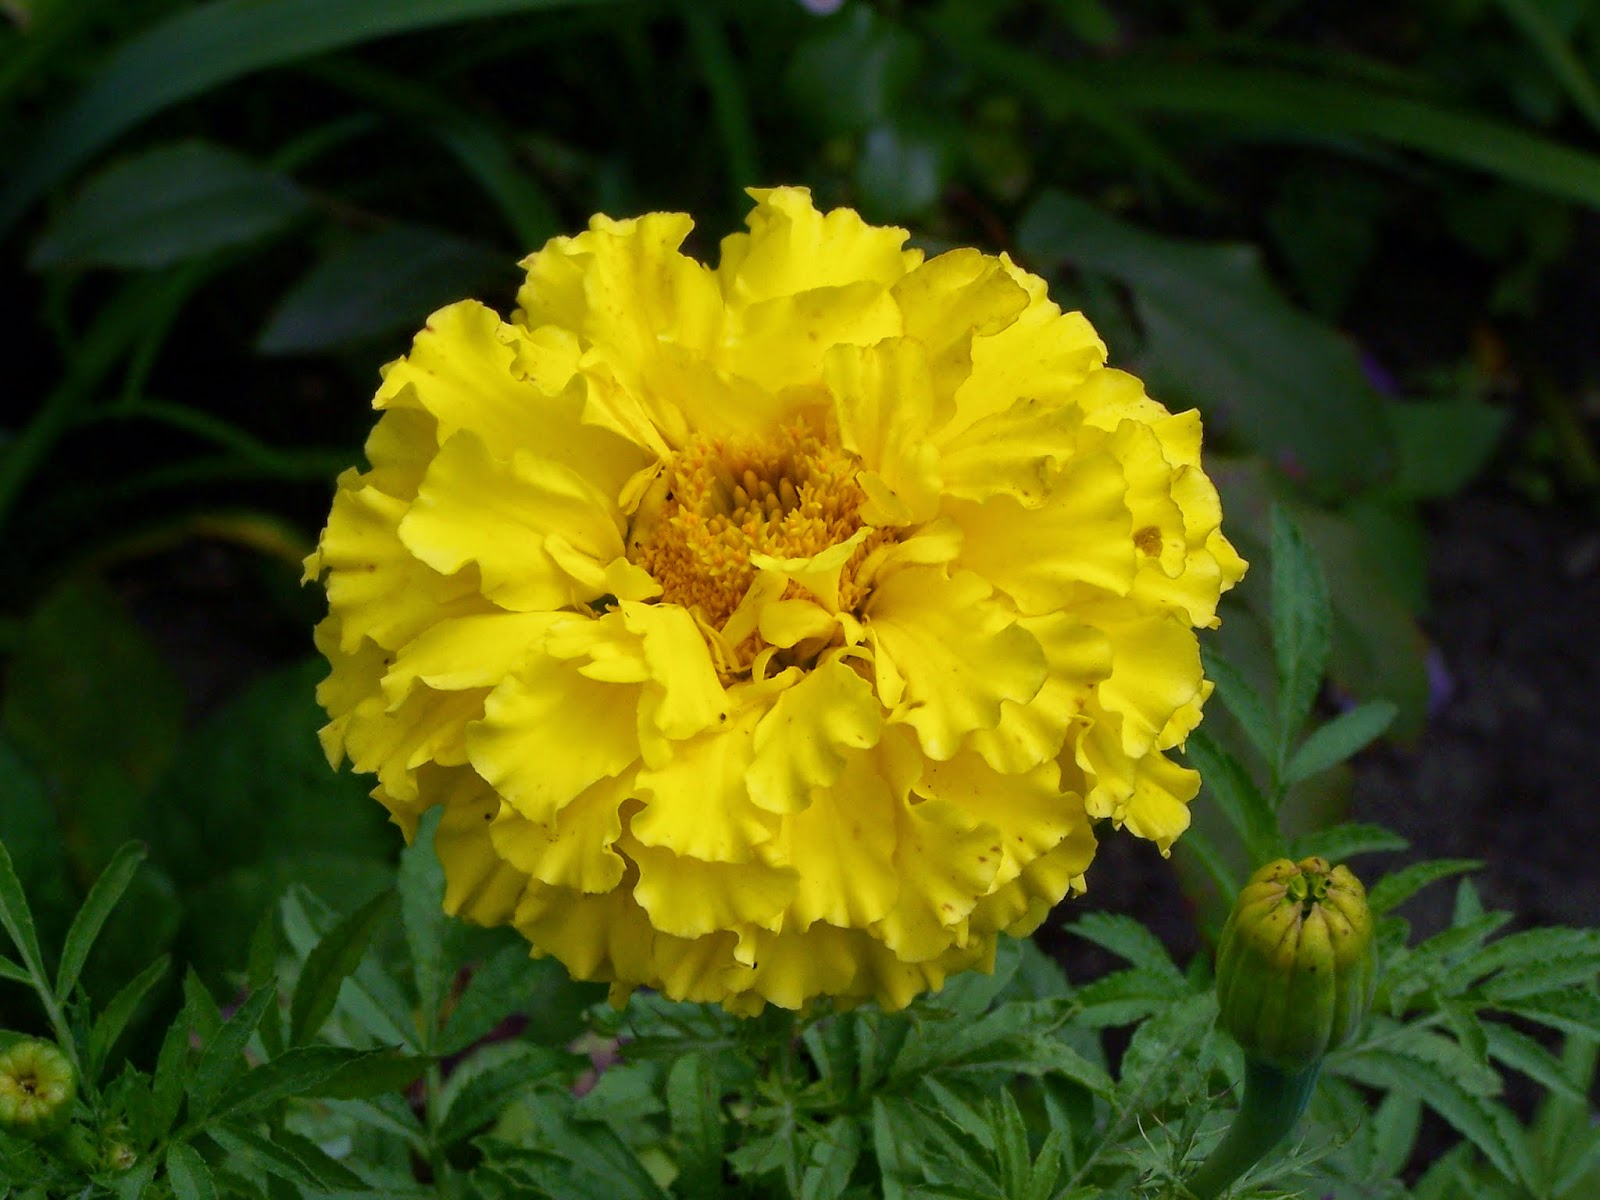 Manfaat dan Khasiat Bunga Marigold atau Calendula (Tagetes Erecta)